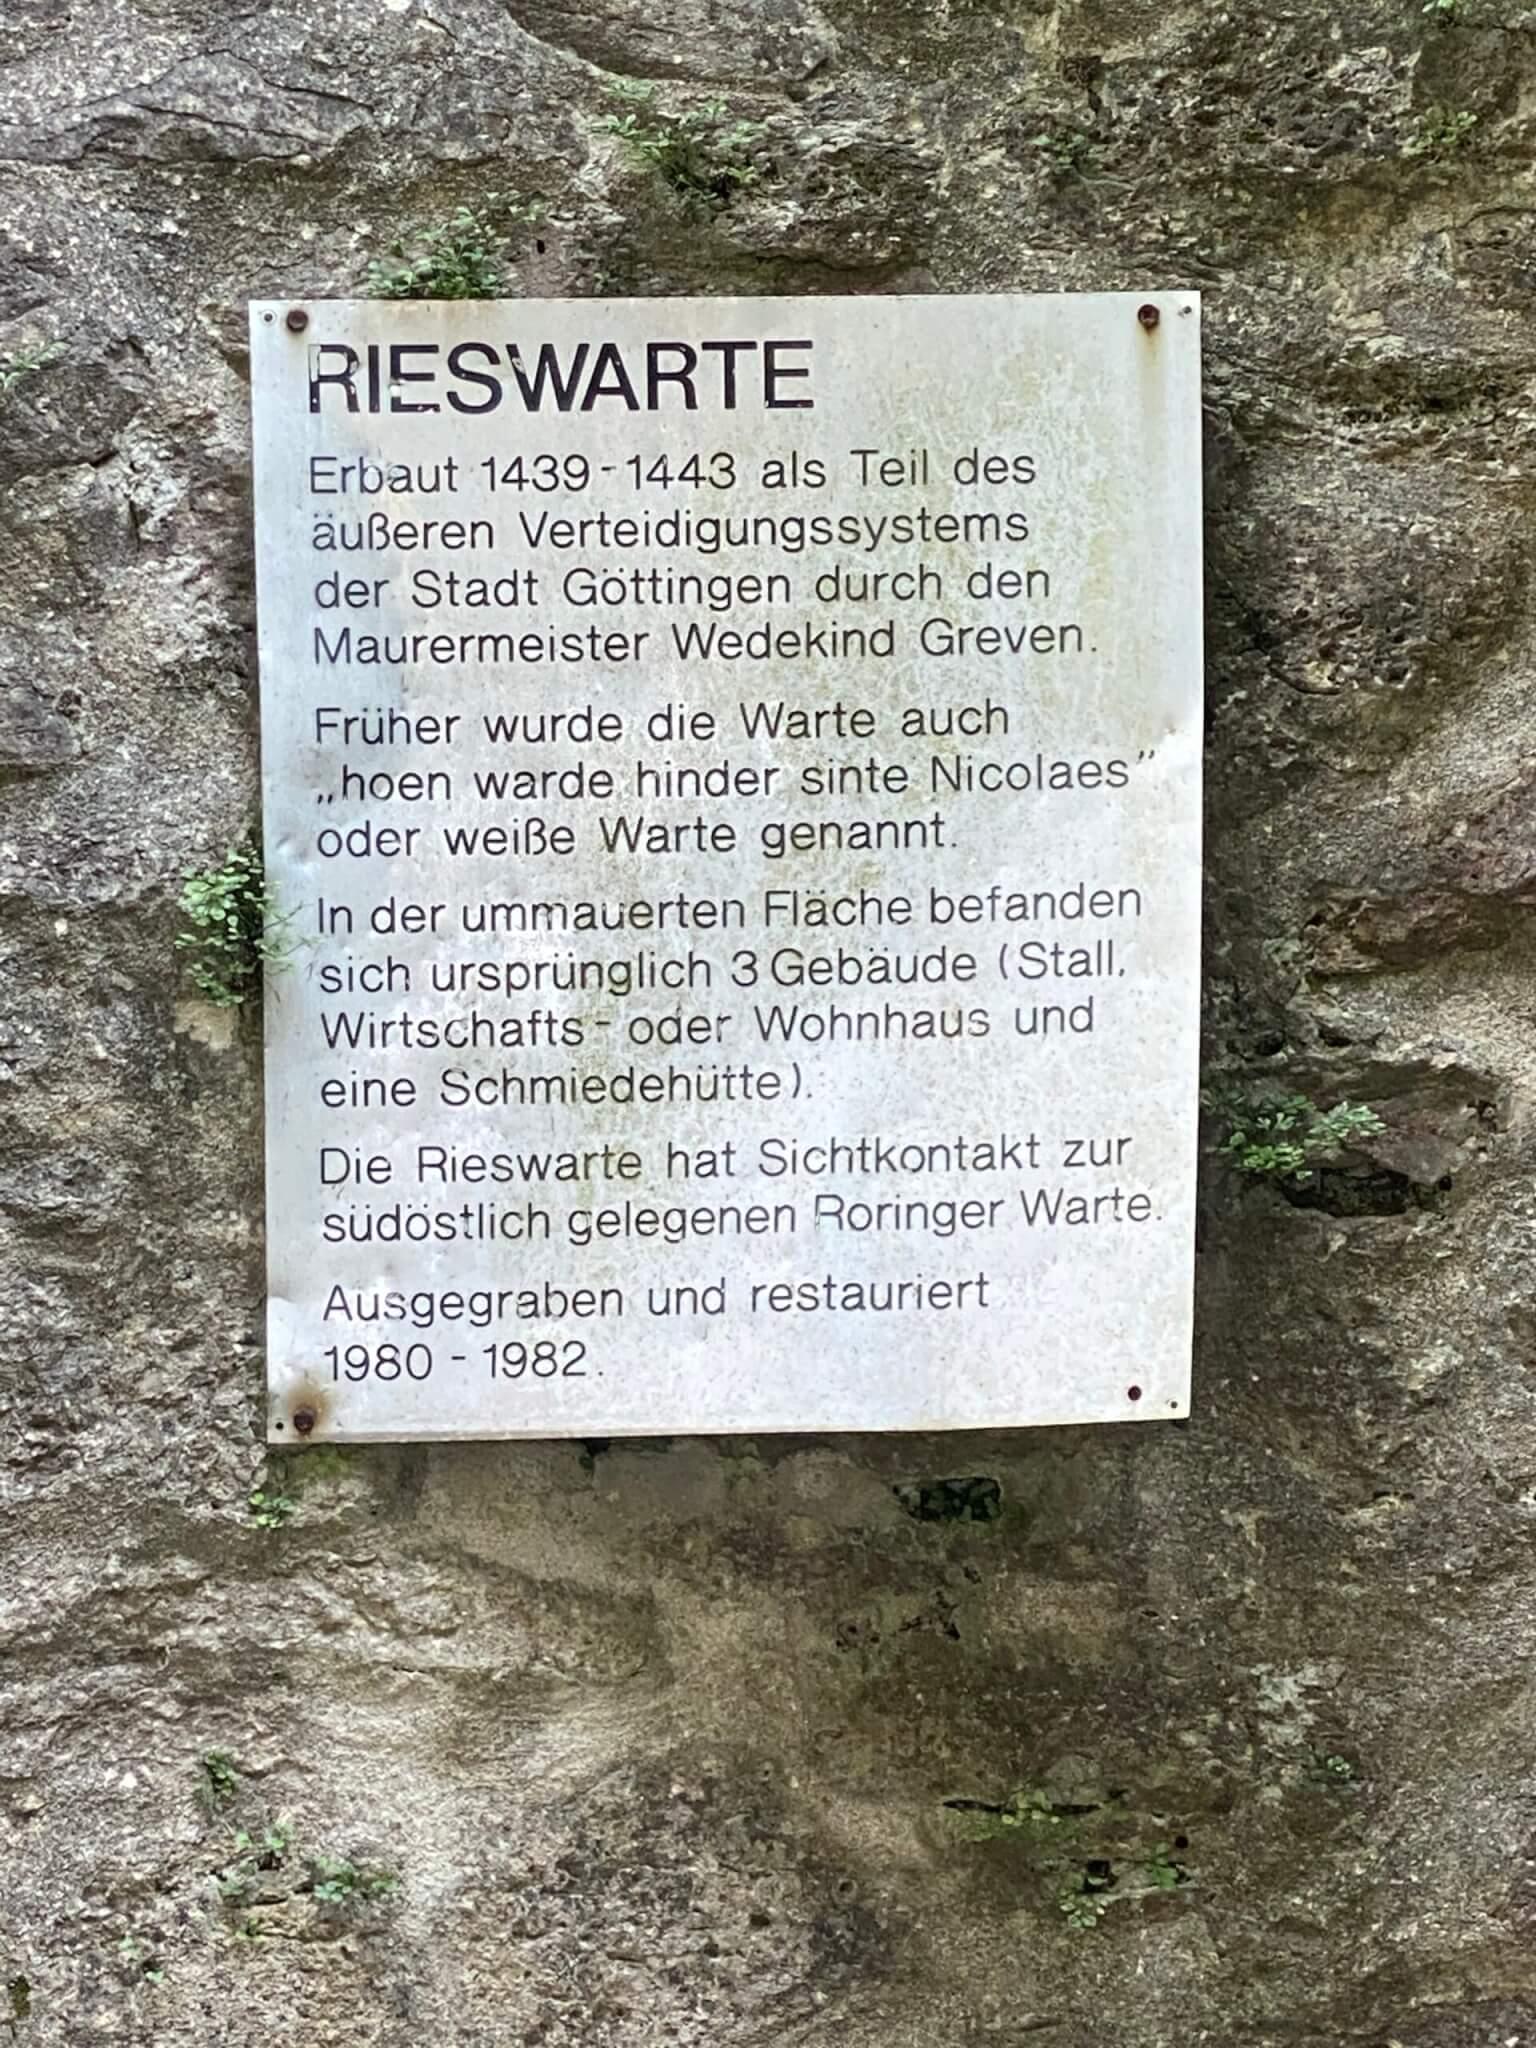 Rieswarte, Göttingen